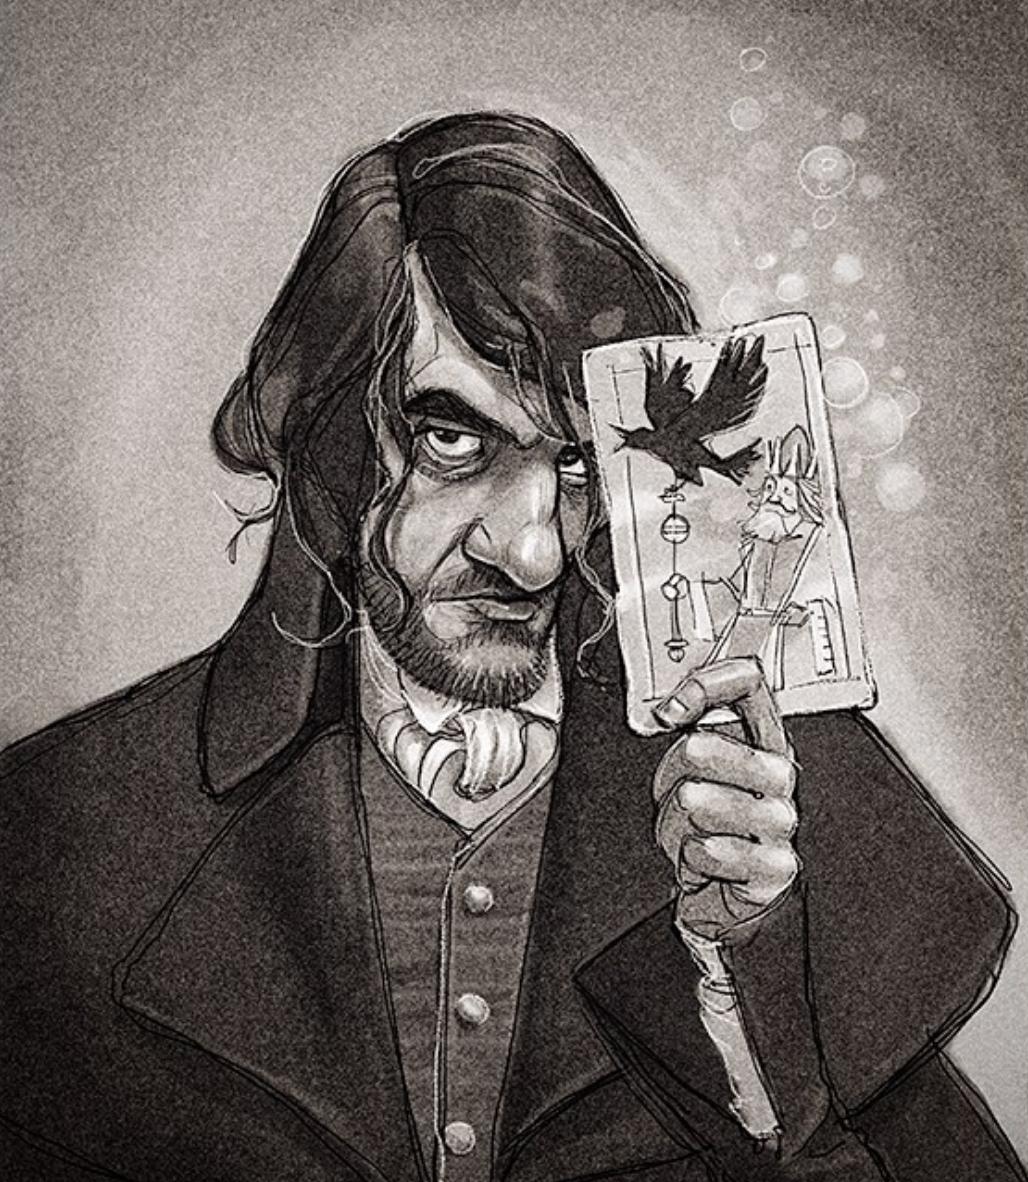 Illustration by David Hohn.